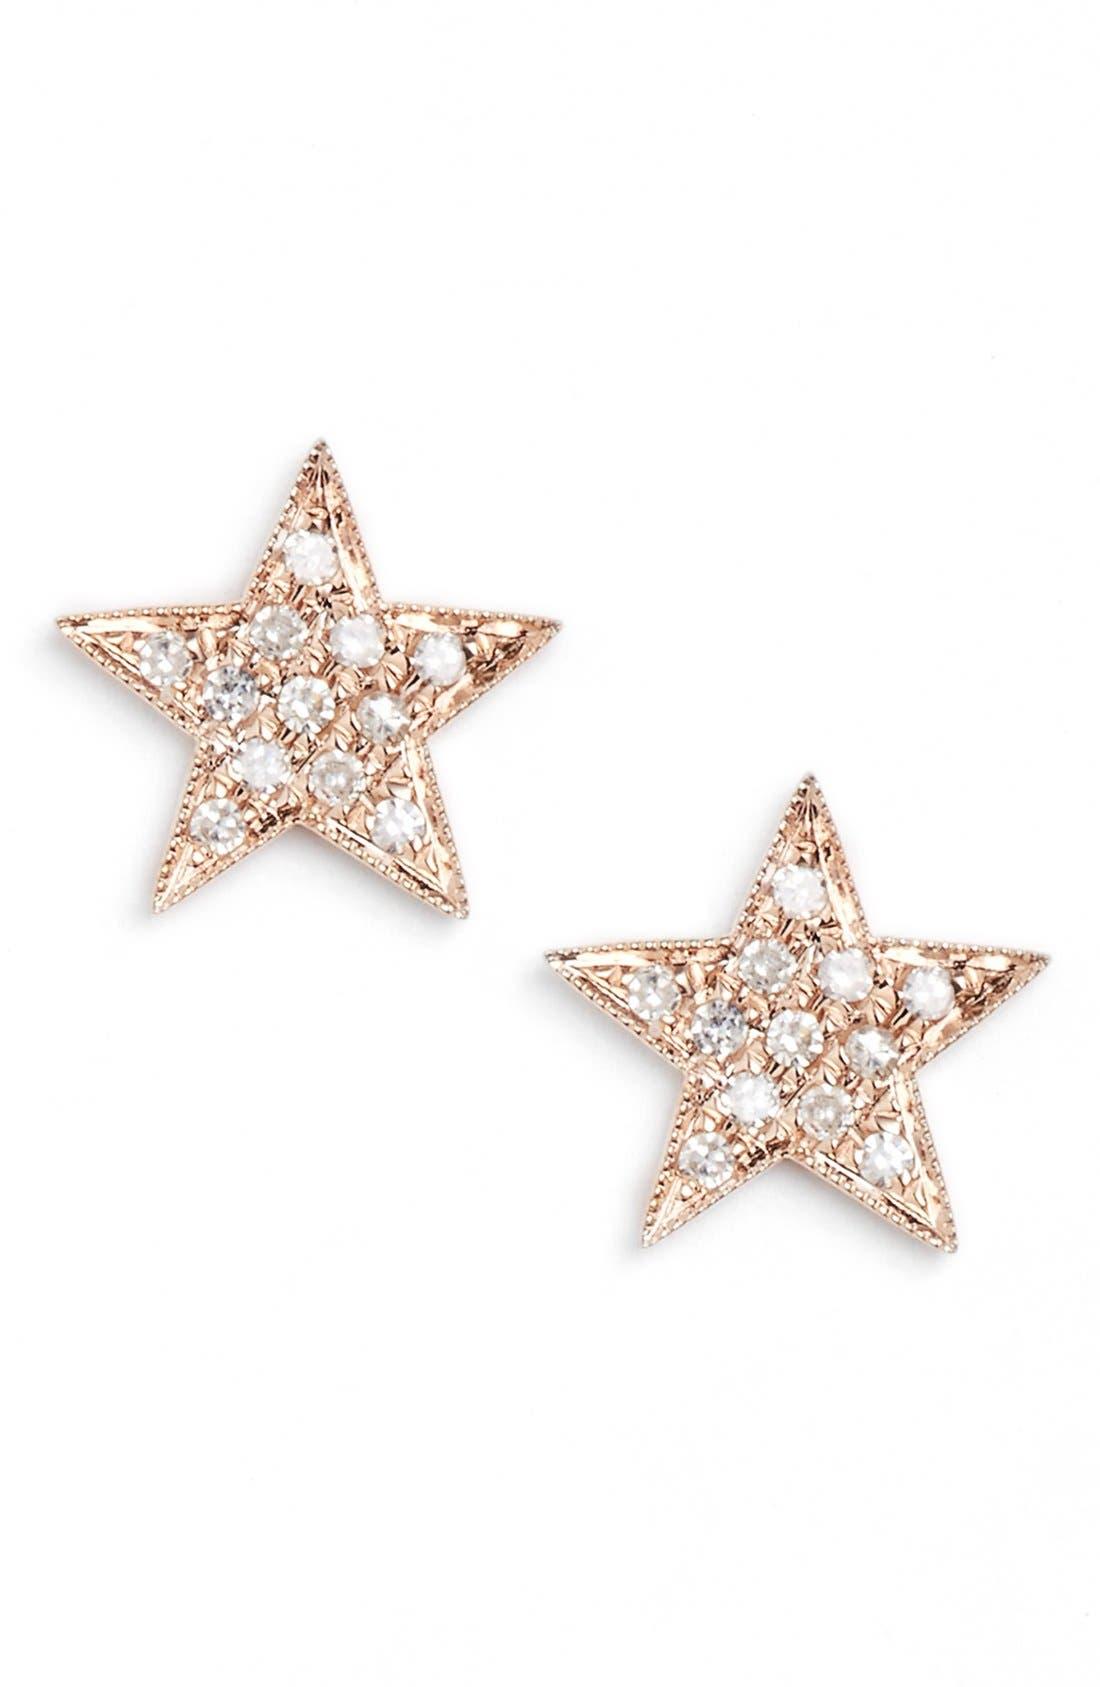 'Julianne Himiko' Diamond Star Stud Earrings,                         Main,                         color, Rose Gold